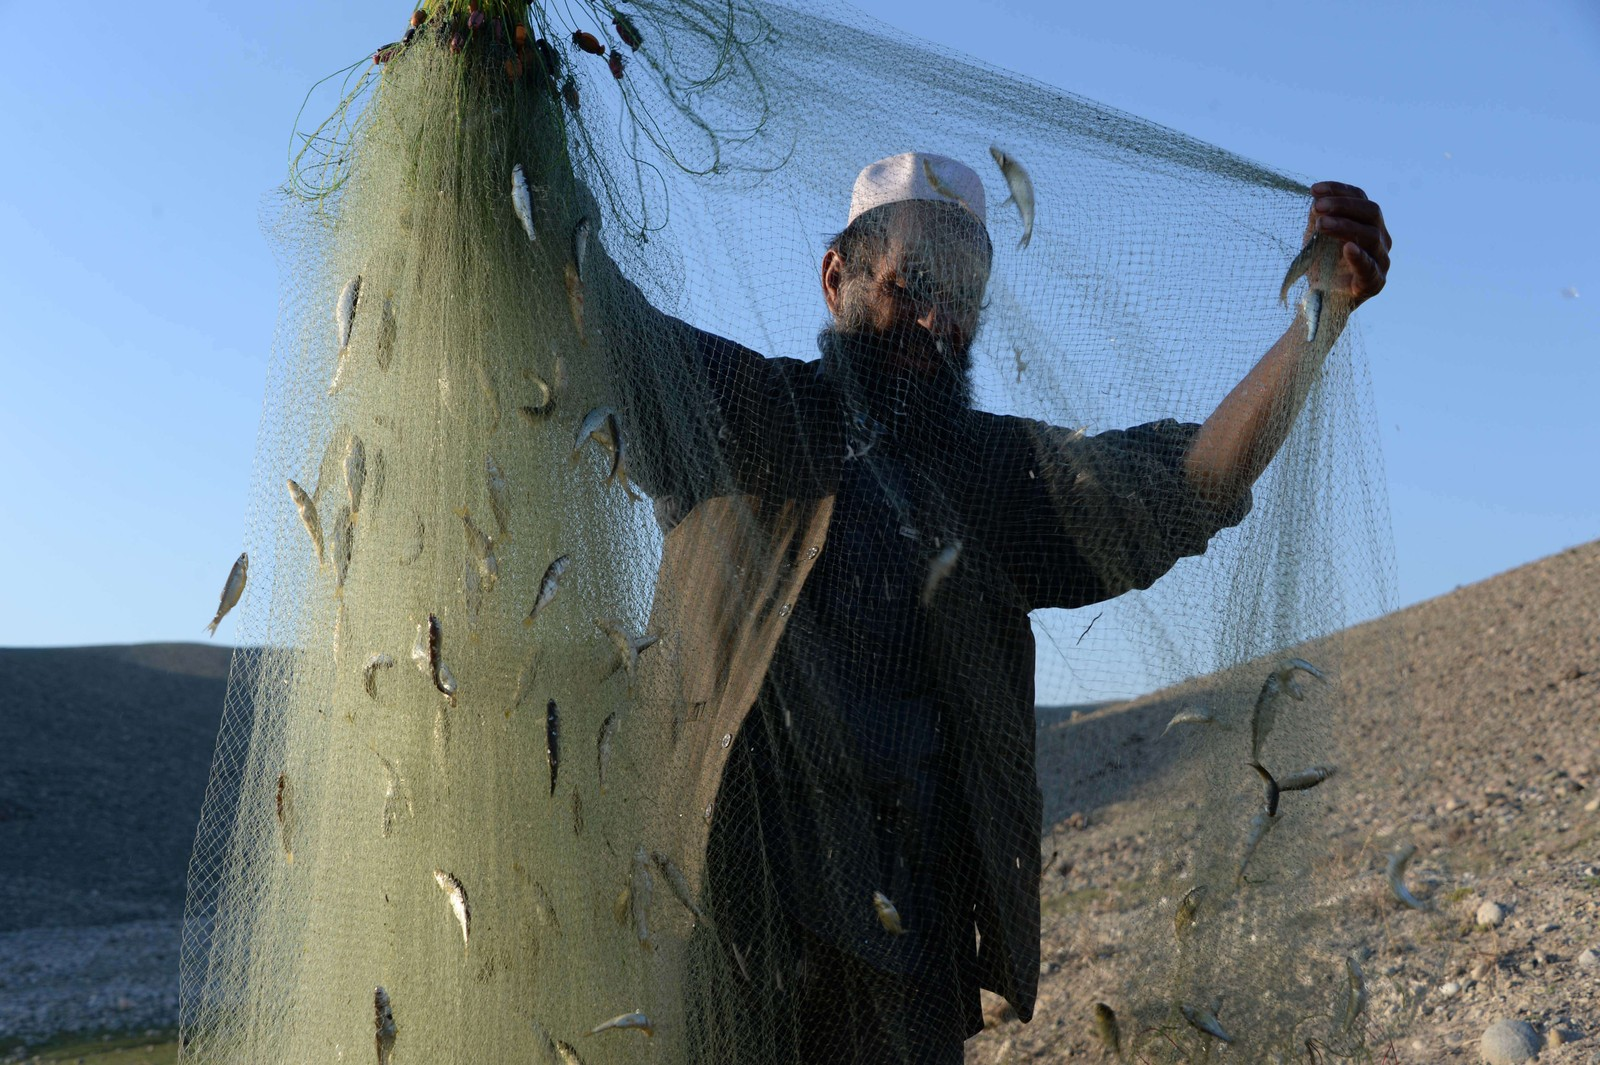 En afghansk fisker betrakter dagens fangst ved en elv i Mehtar Lam i Laghman provinsen.